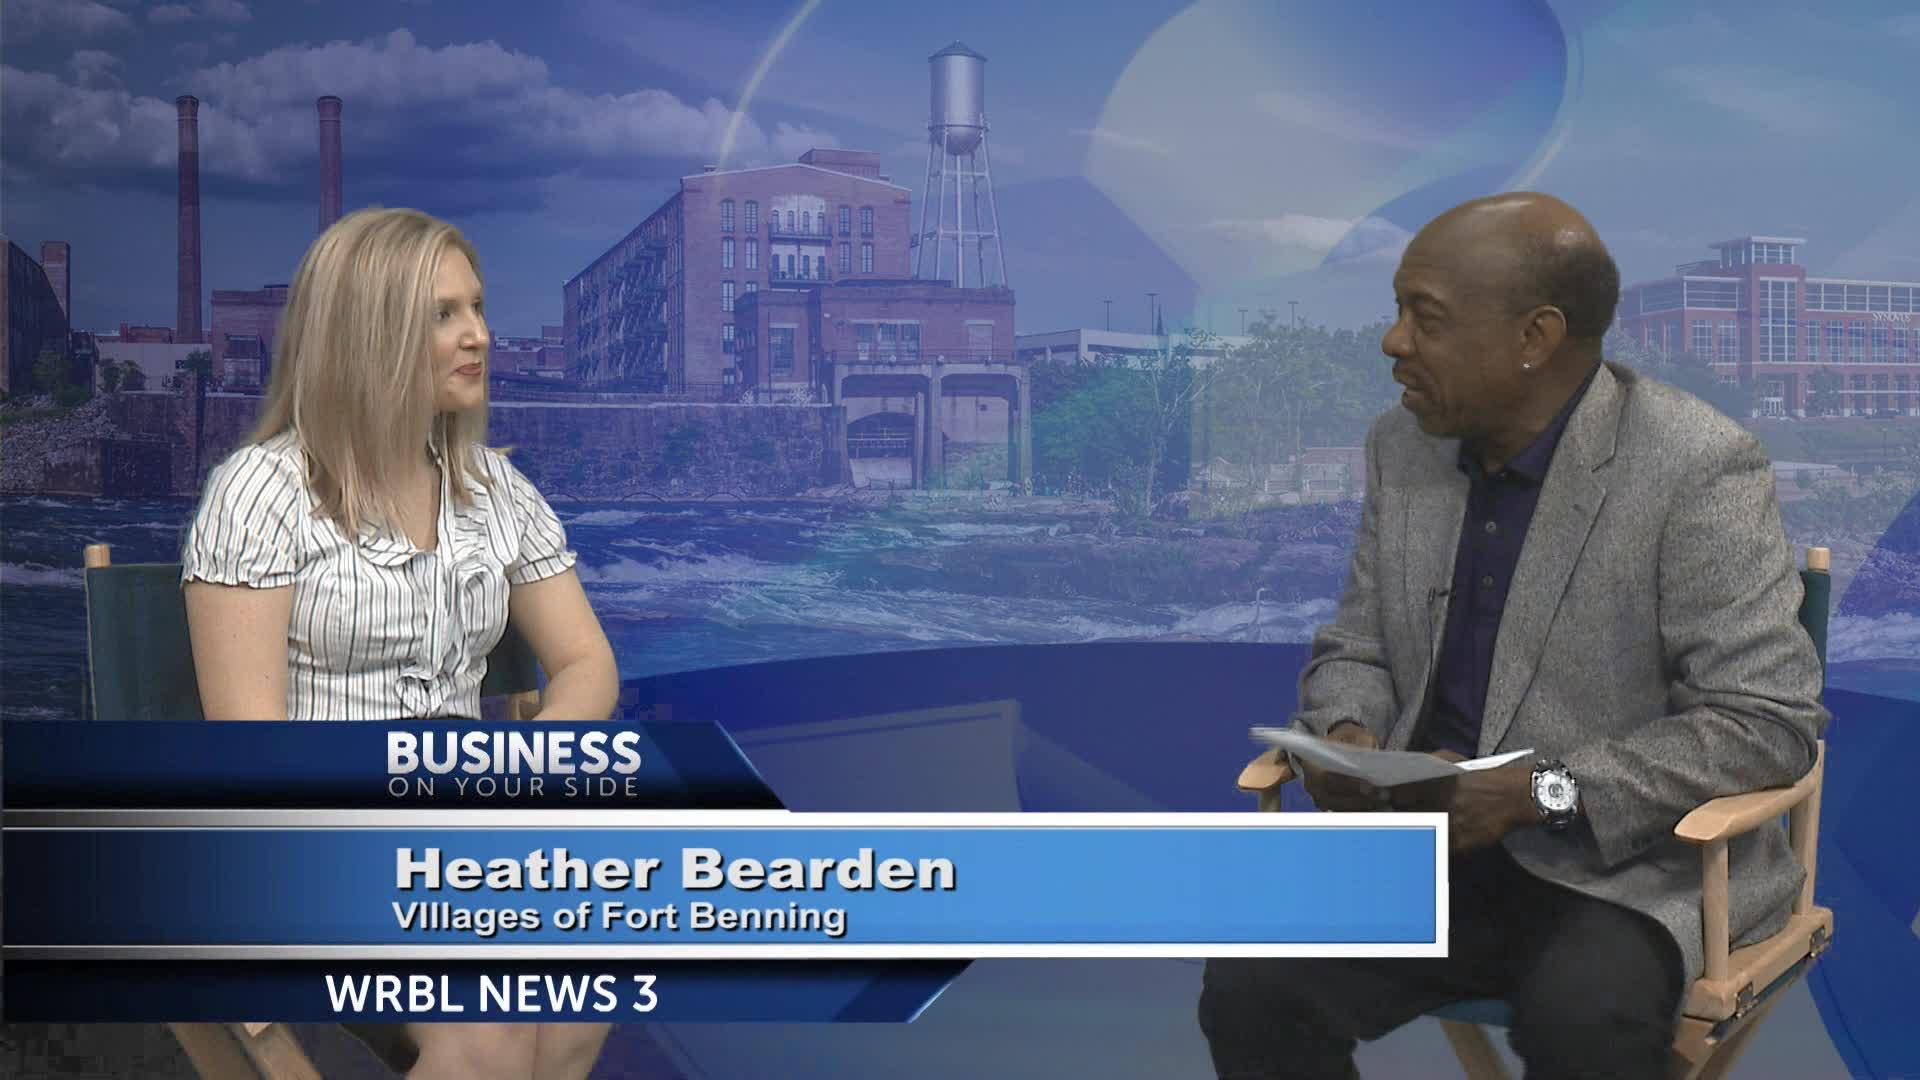 Business On Your Side: Villages of Fort Benning